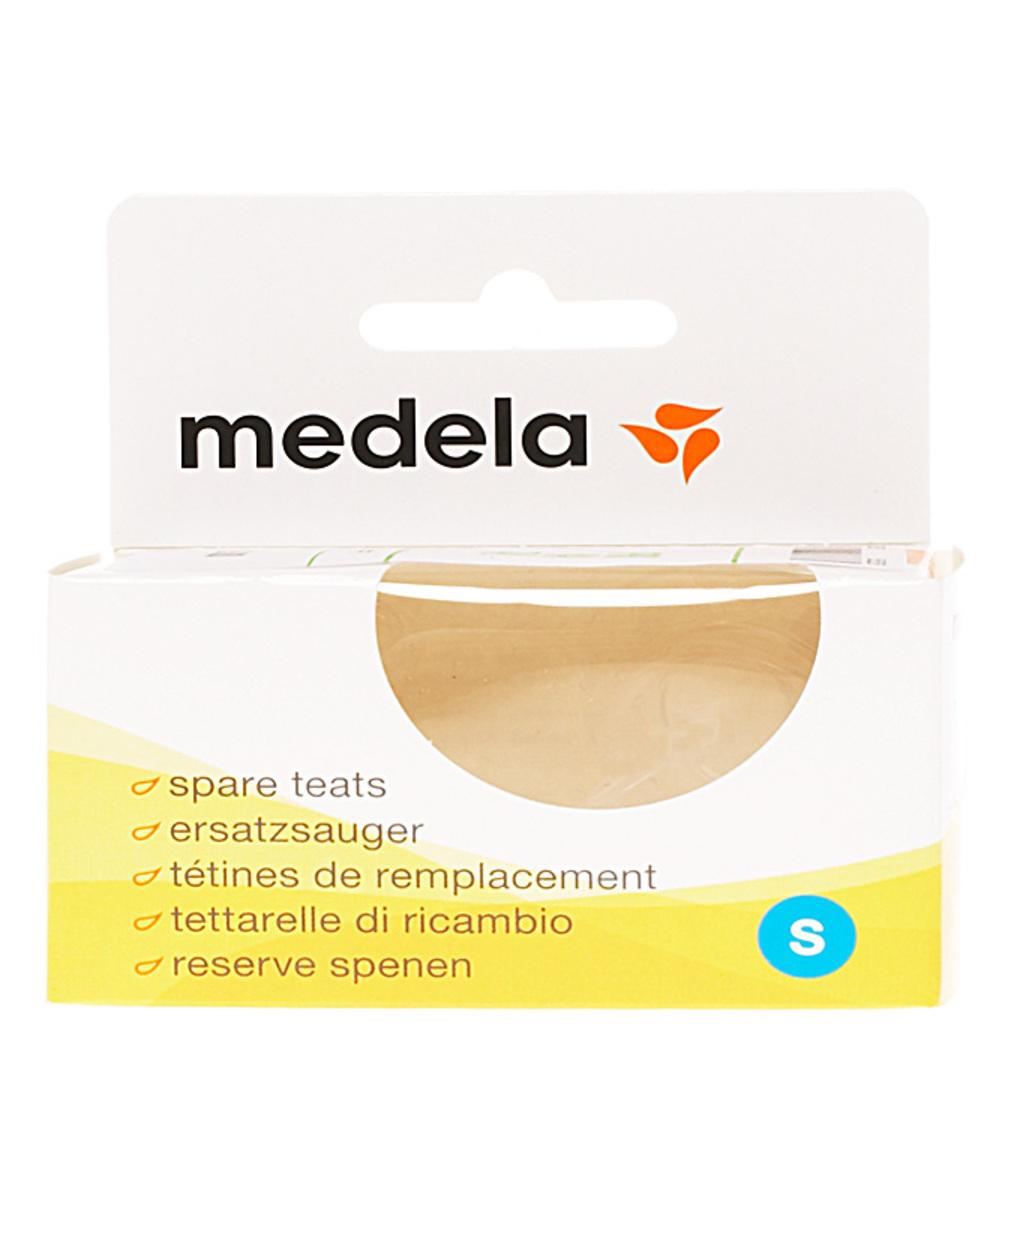 Tettarelle silicone, flusso lento, 2 pz - Medela